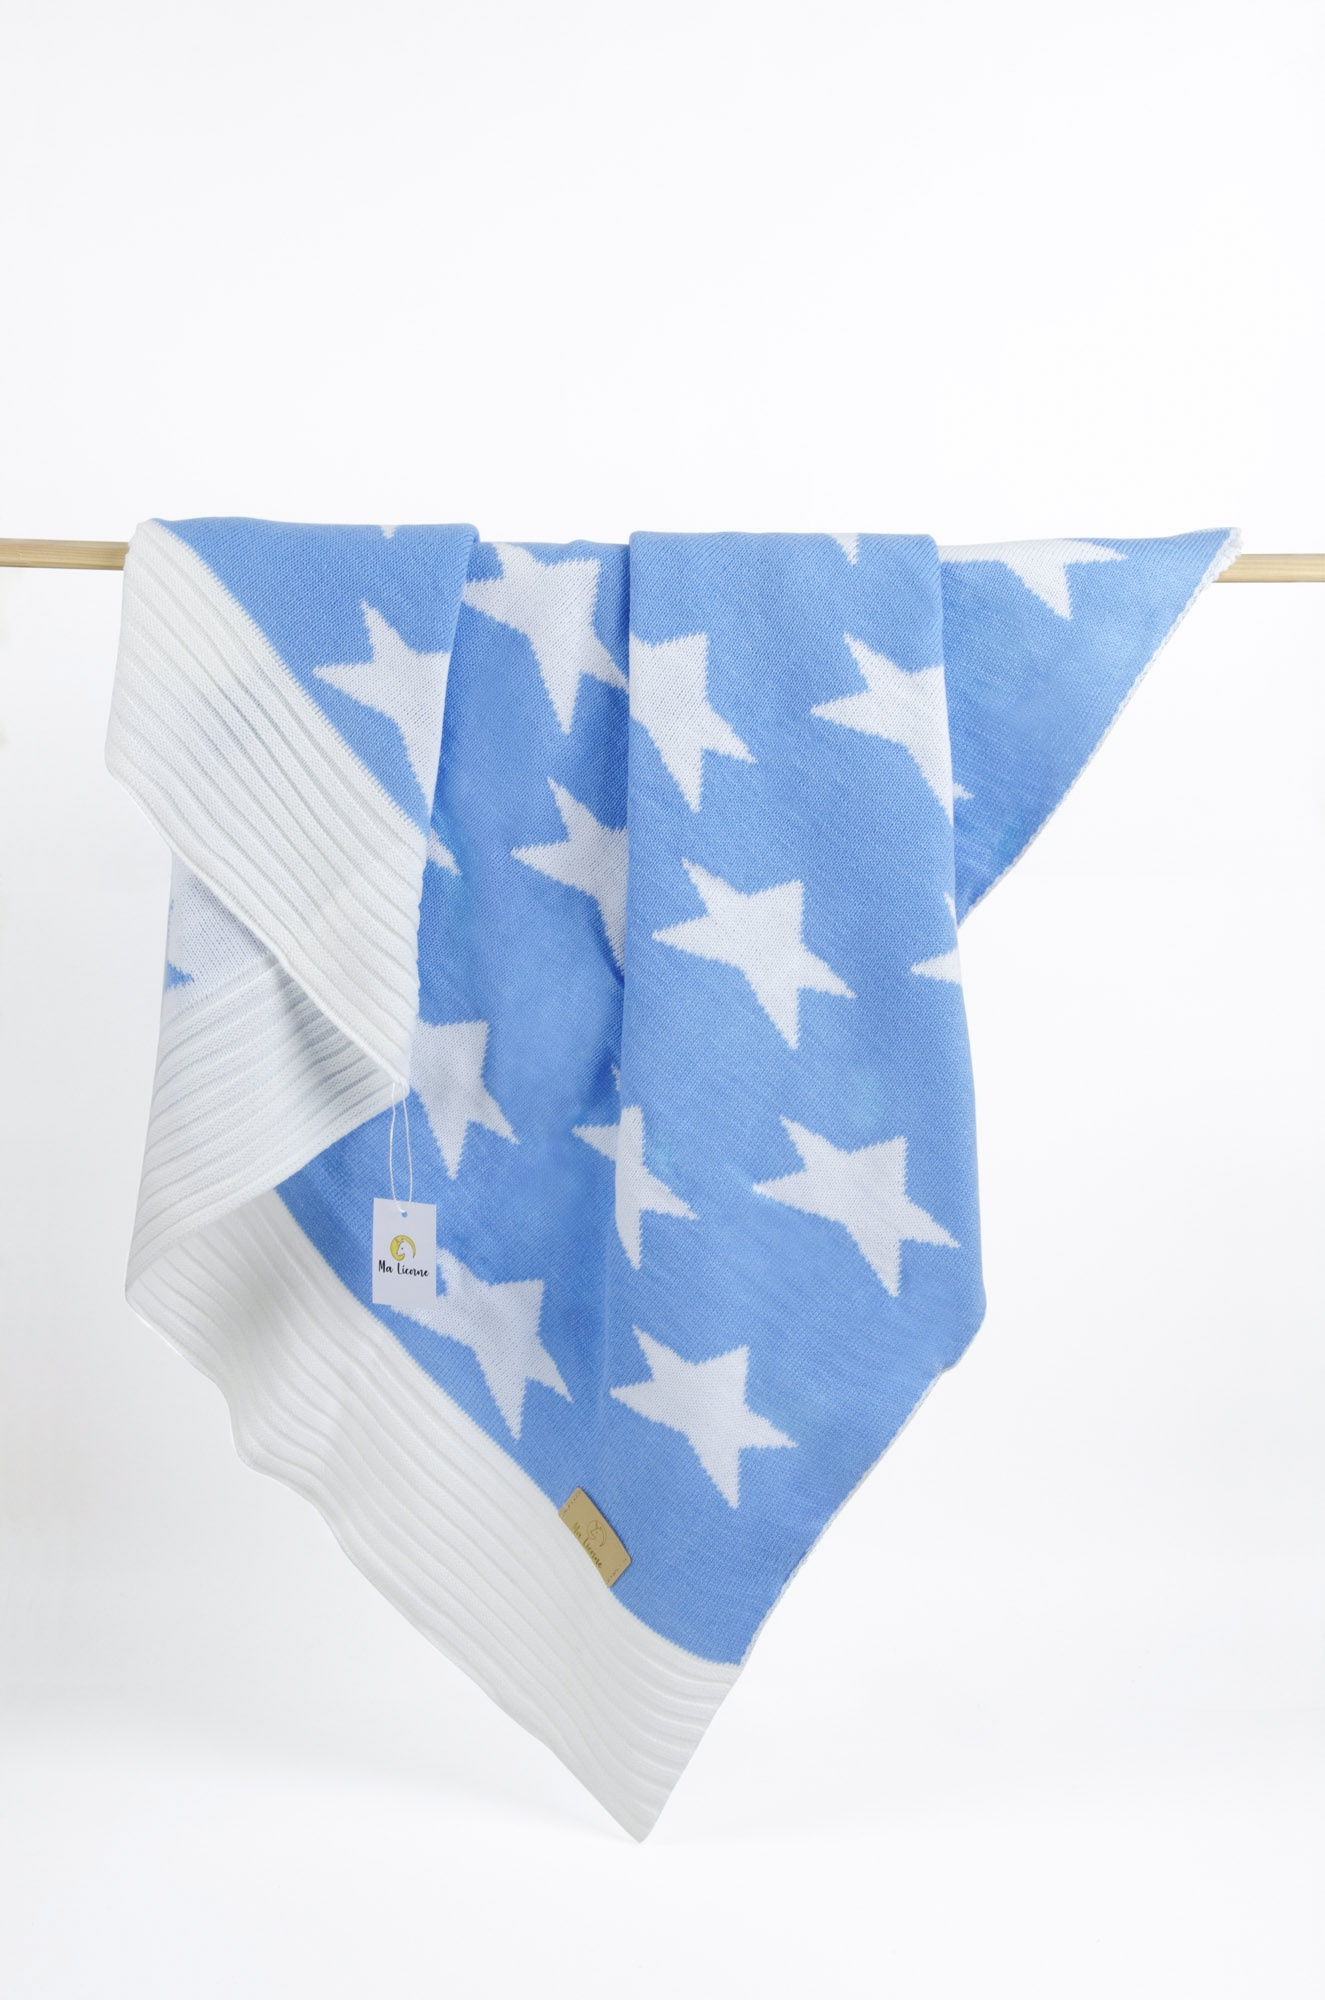 Детский плед Ma Licorne Star, голубой